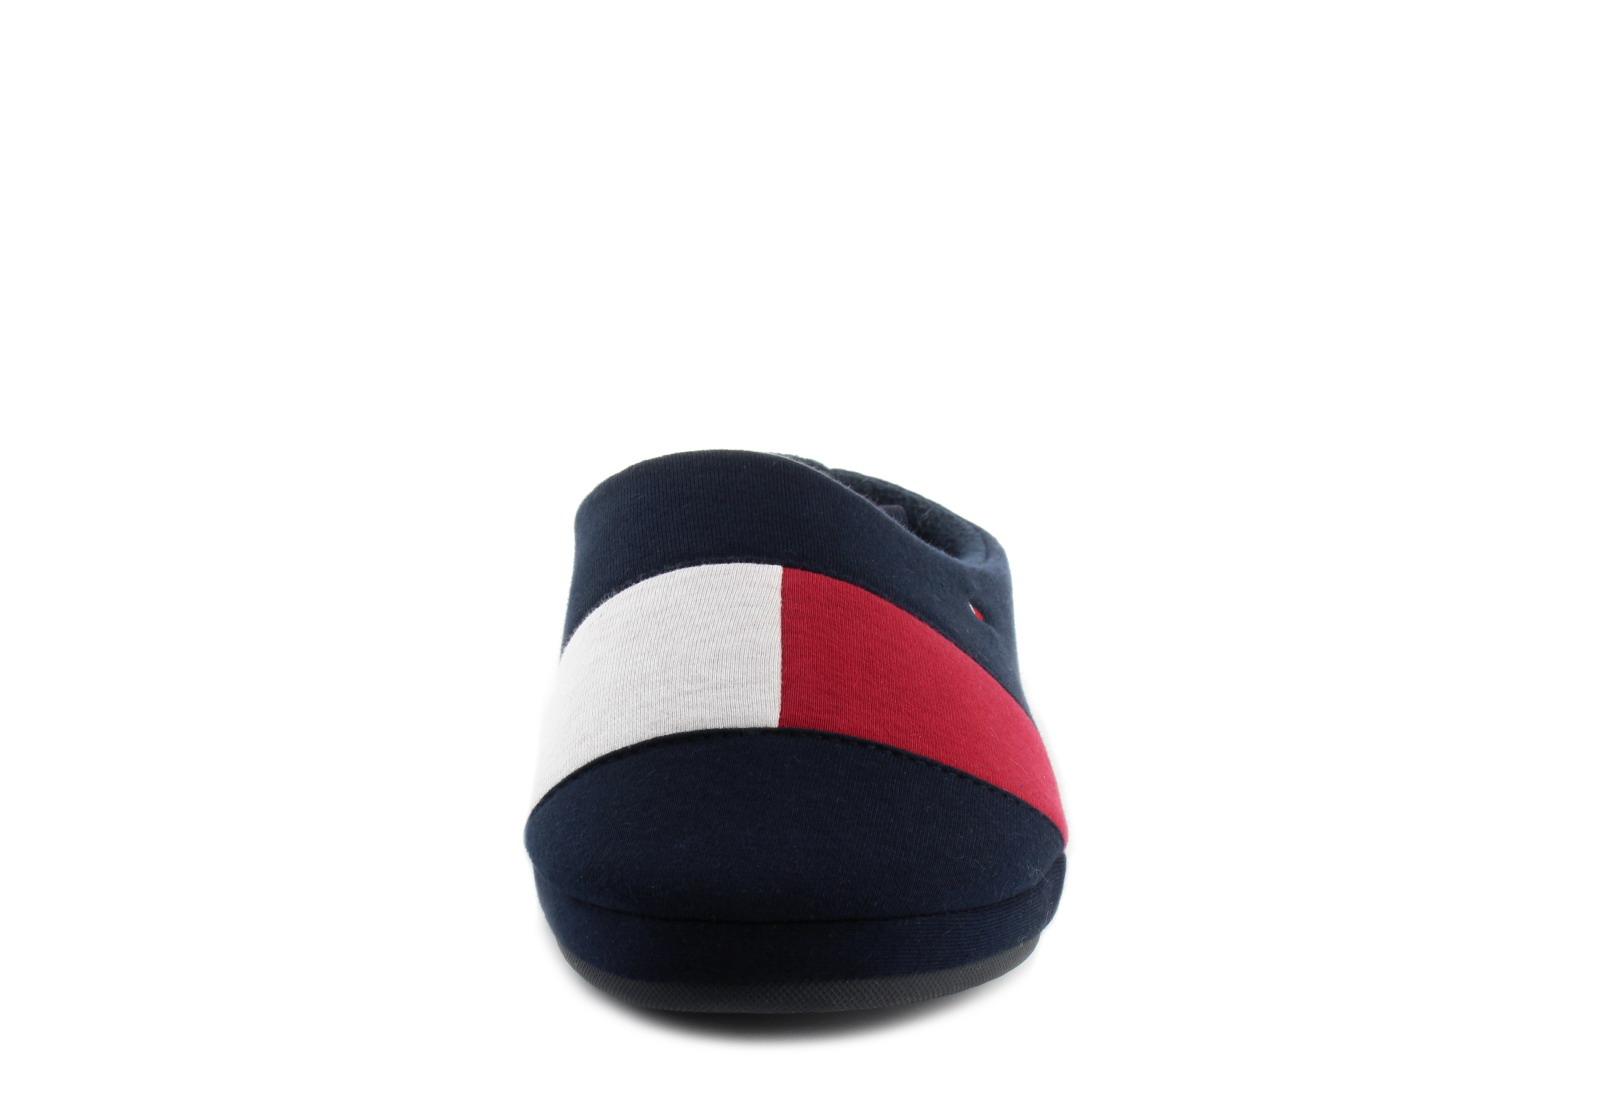 838957f592 Tommy Hilfiger Papuče Plave Papuče I Natikače - Cornwall Flag ...